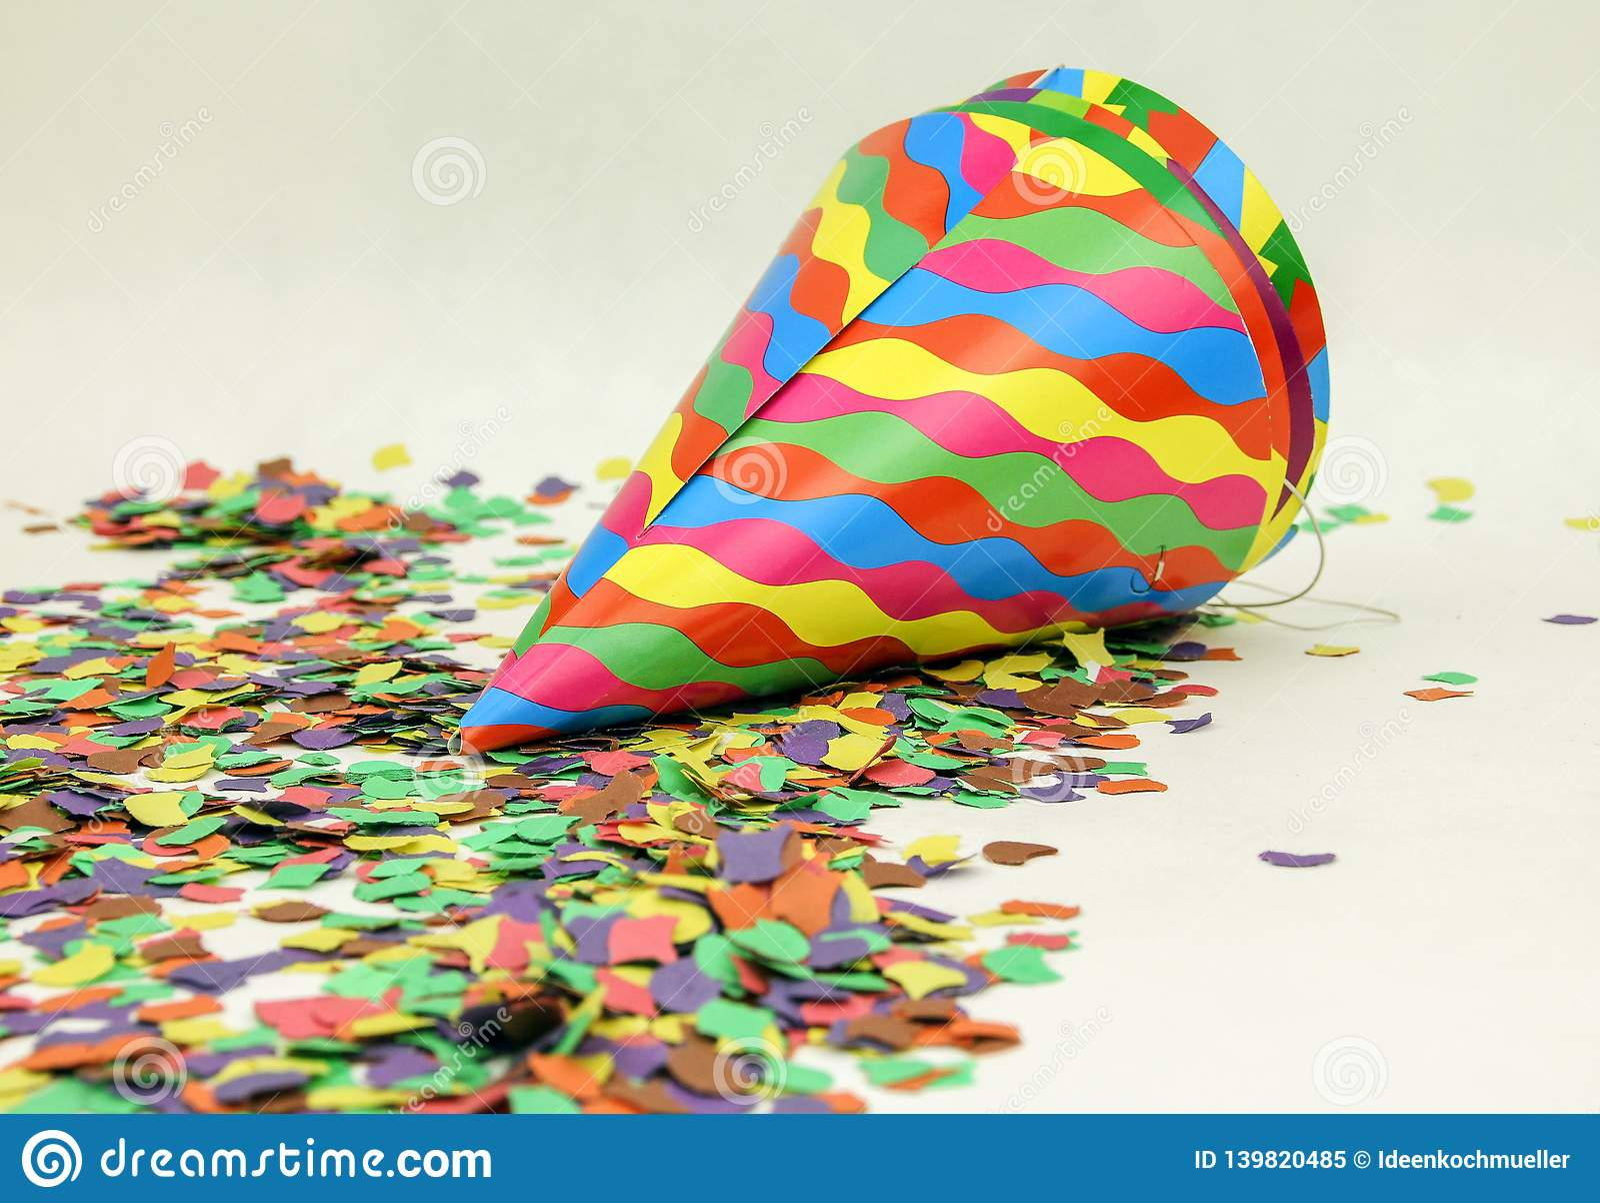 Confetti and colorful hats